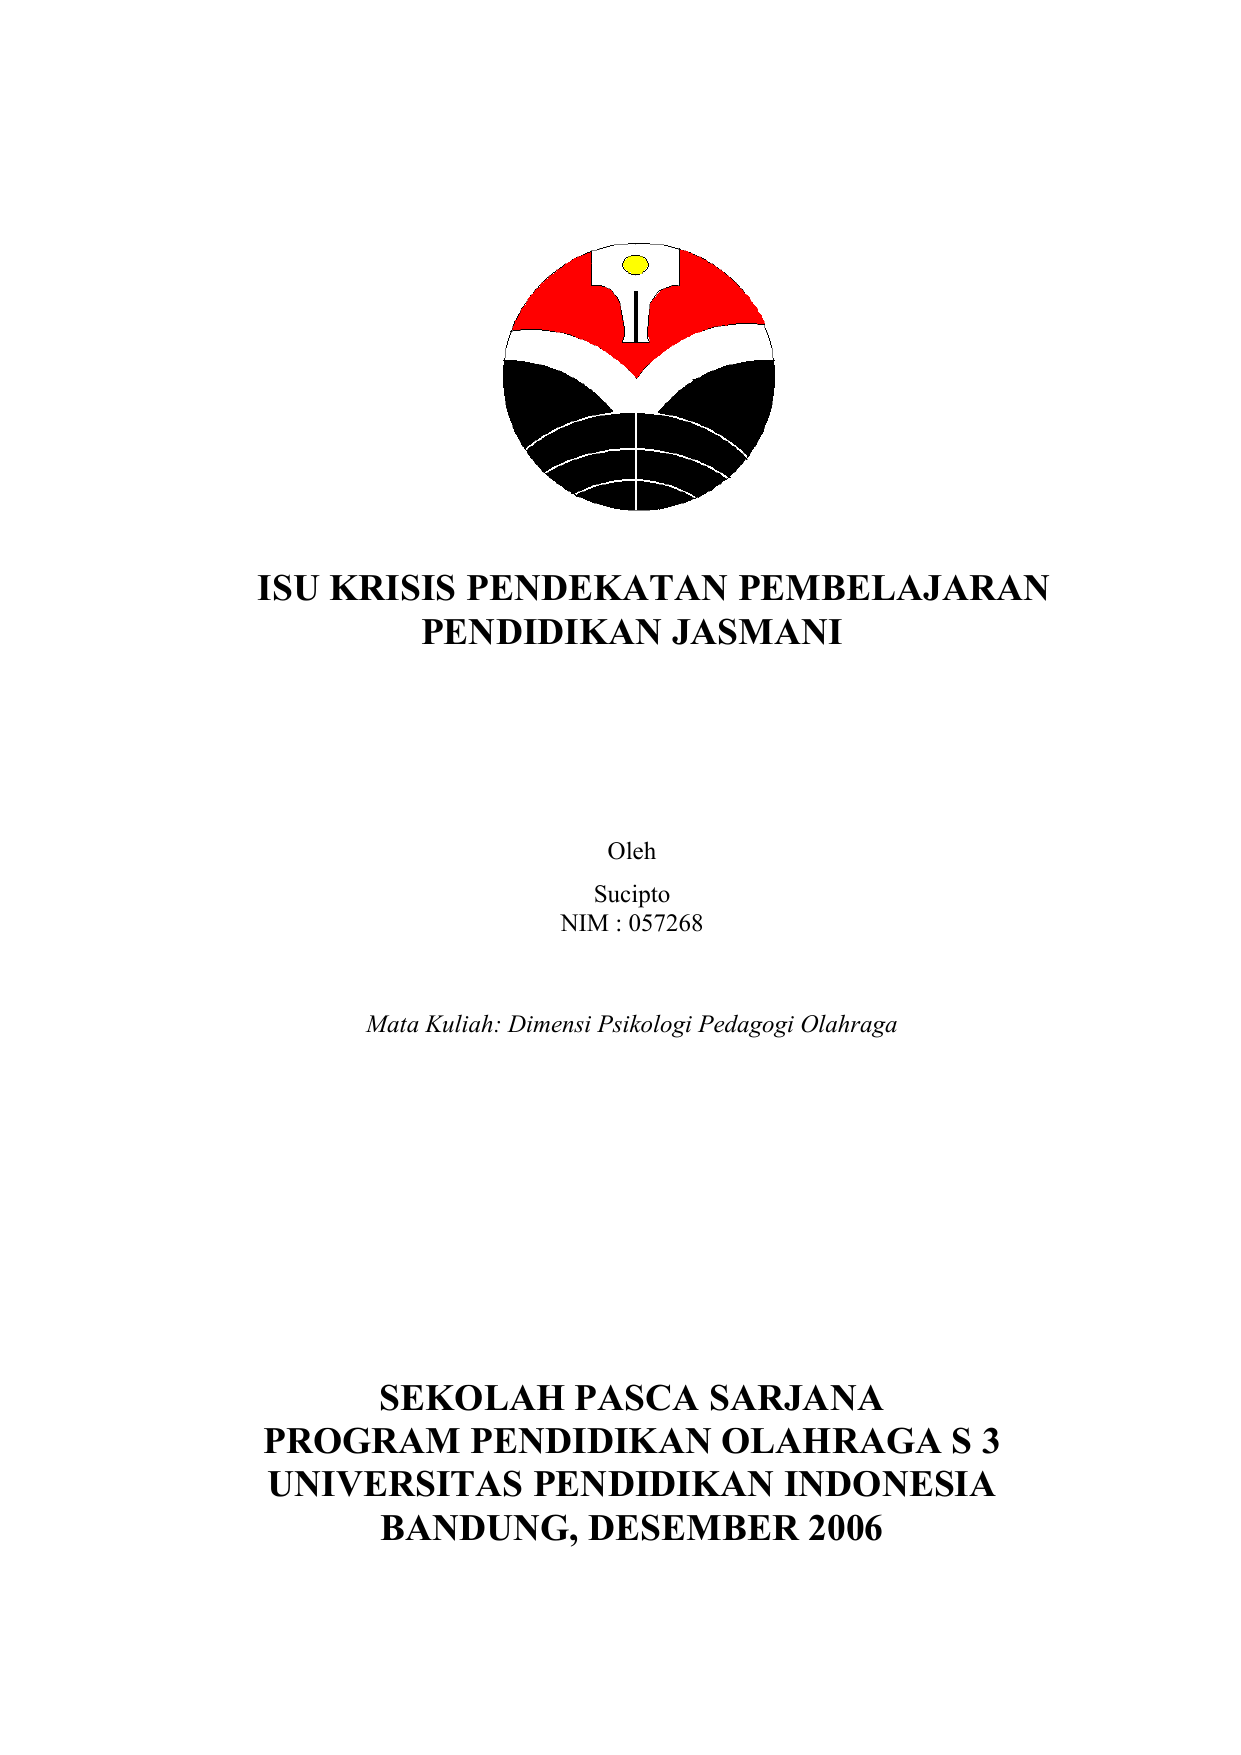 Pengajuan Proposal Penelitian Dana Rutin